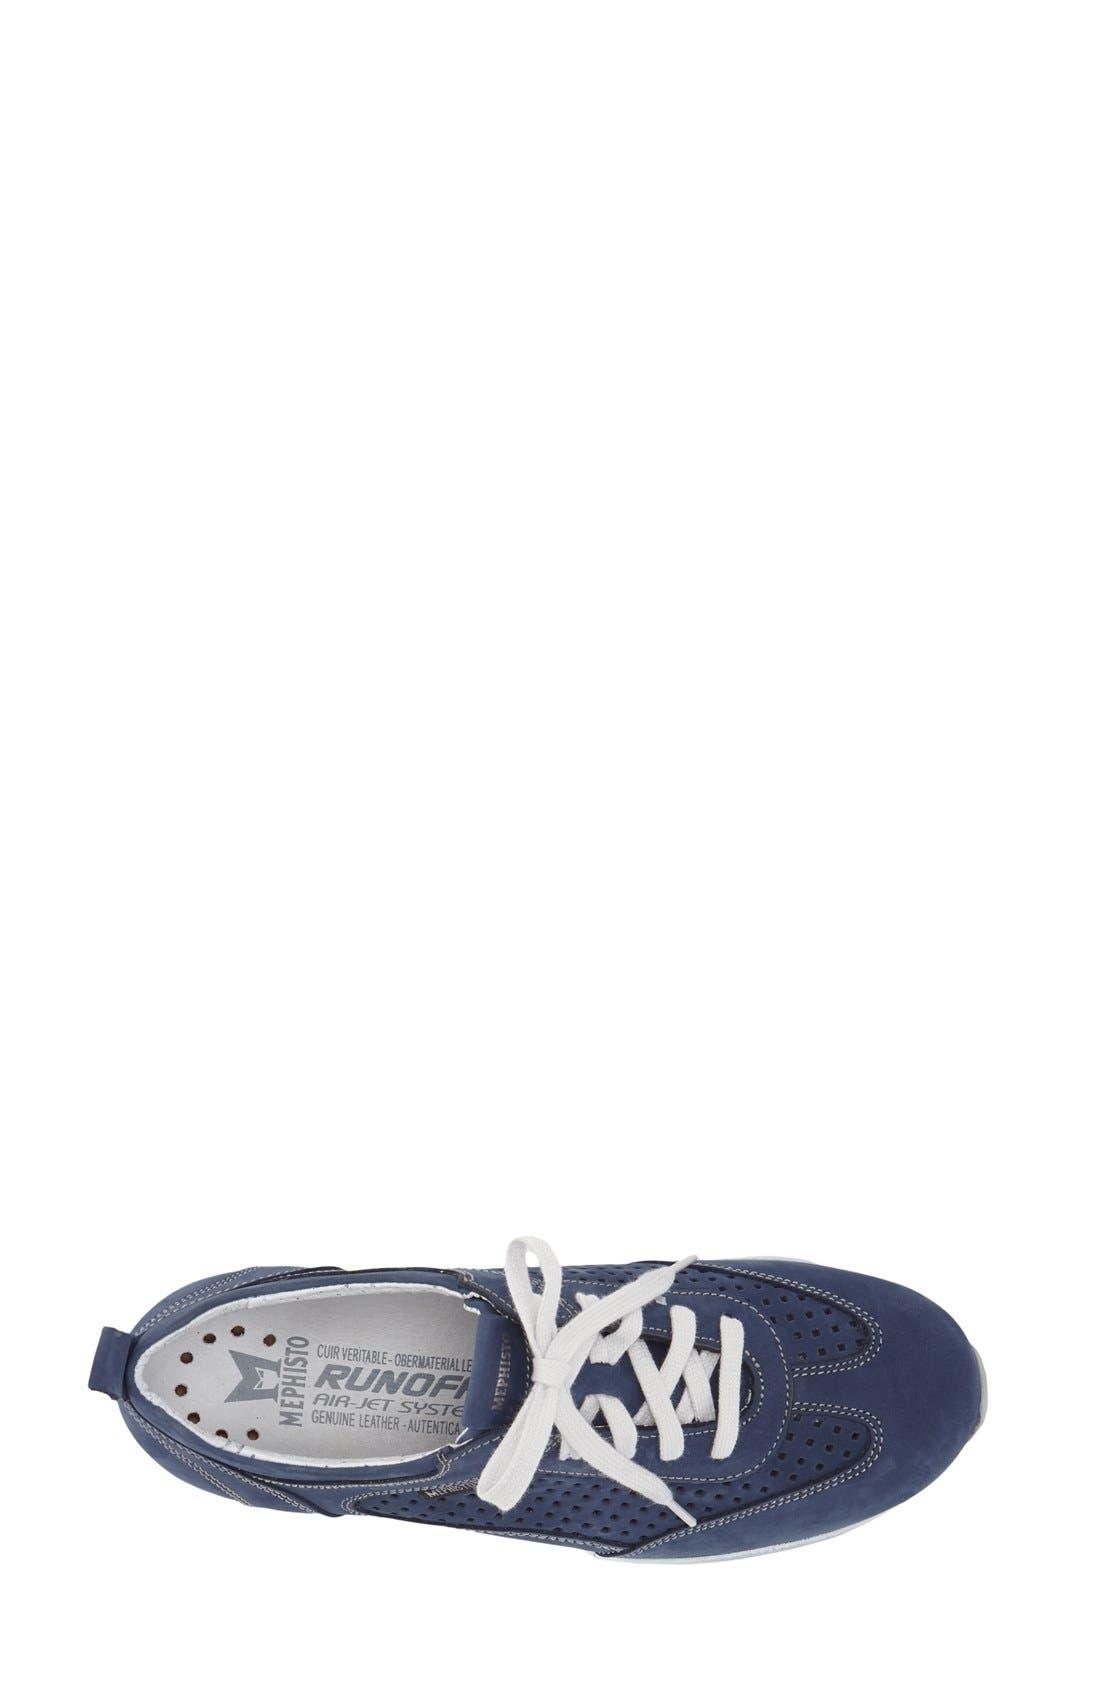 Mephisto Women's 'Yoana' Soft Air Perforated Sneaker bDm3l3k